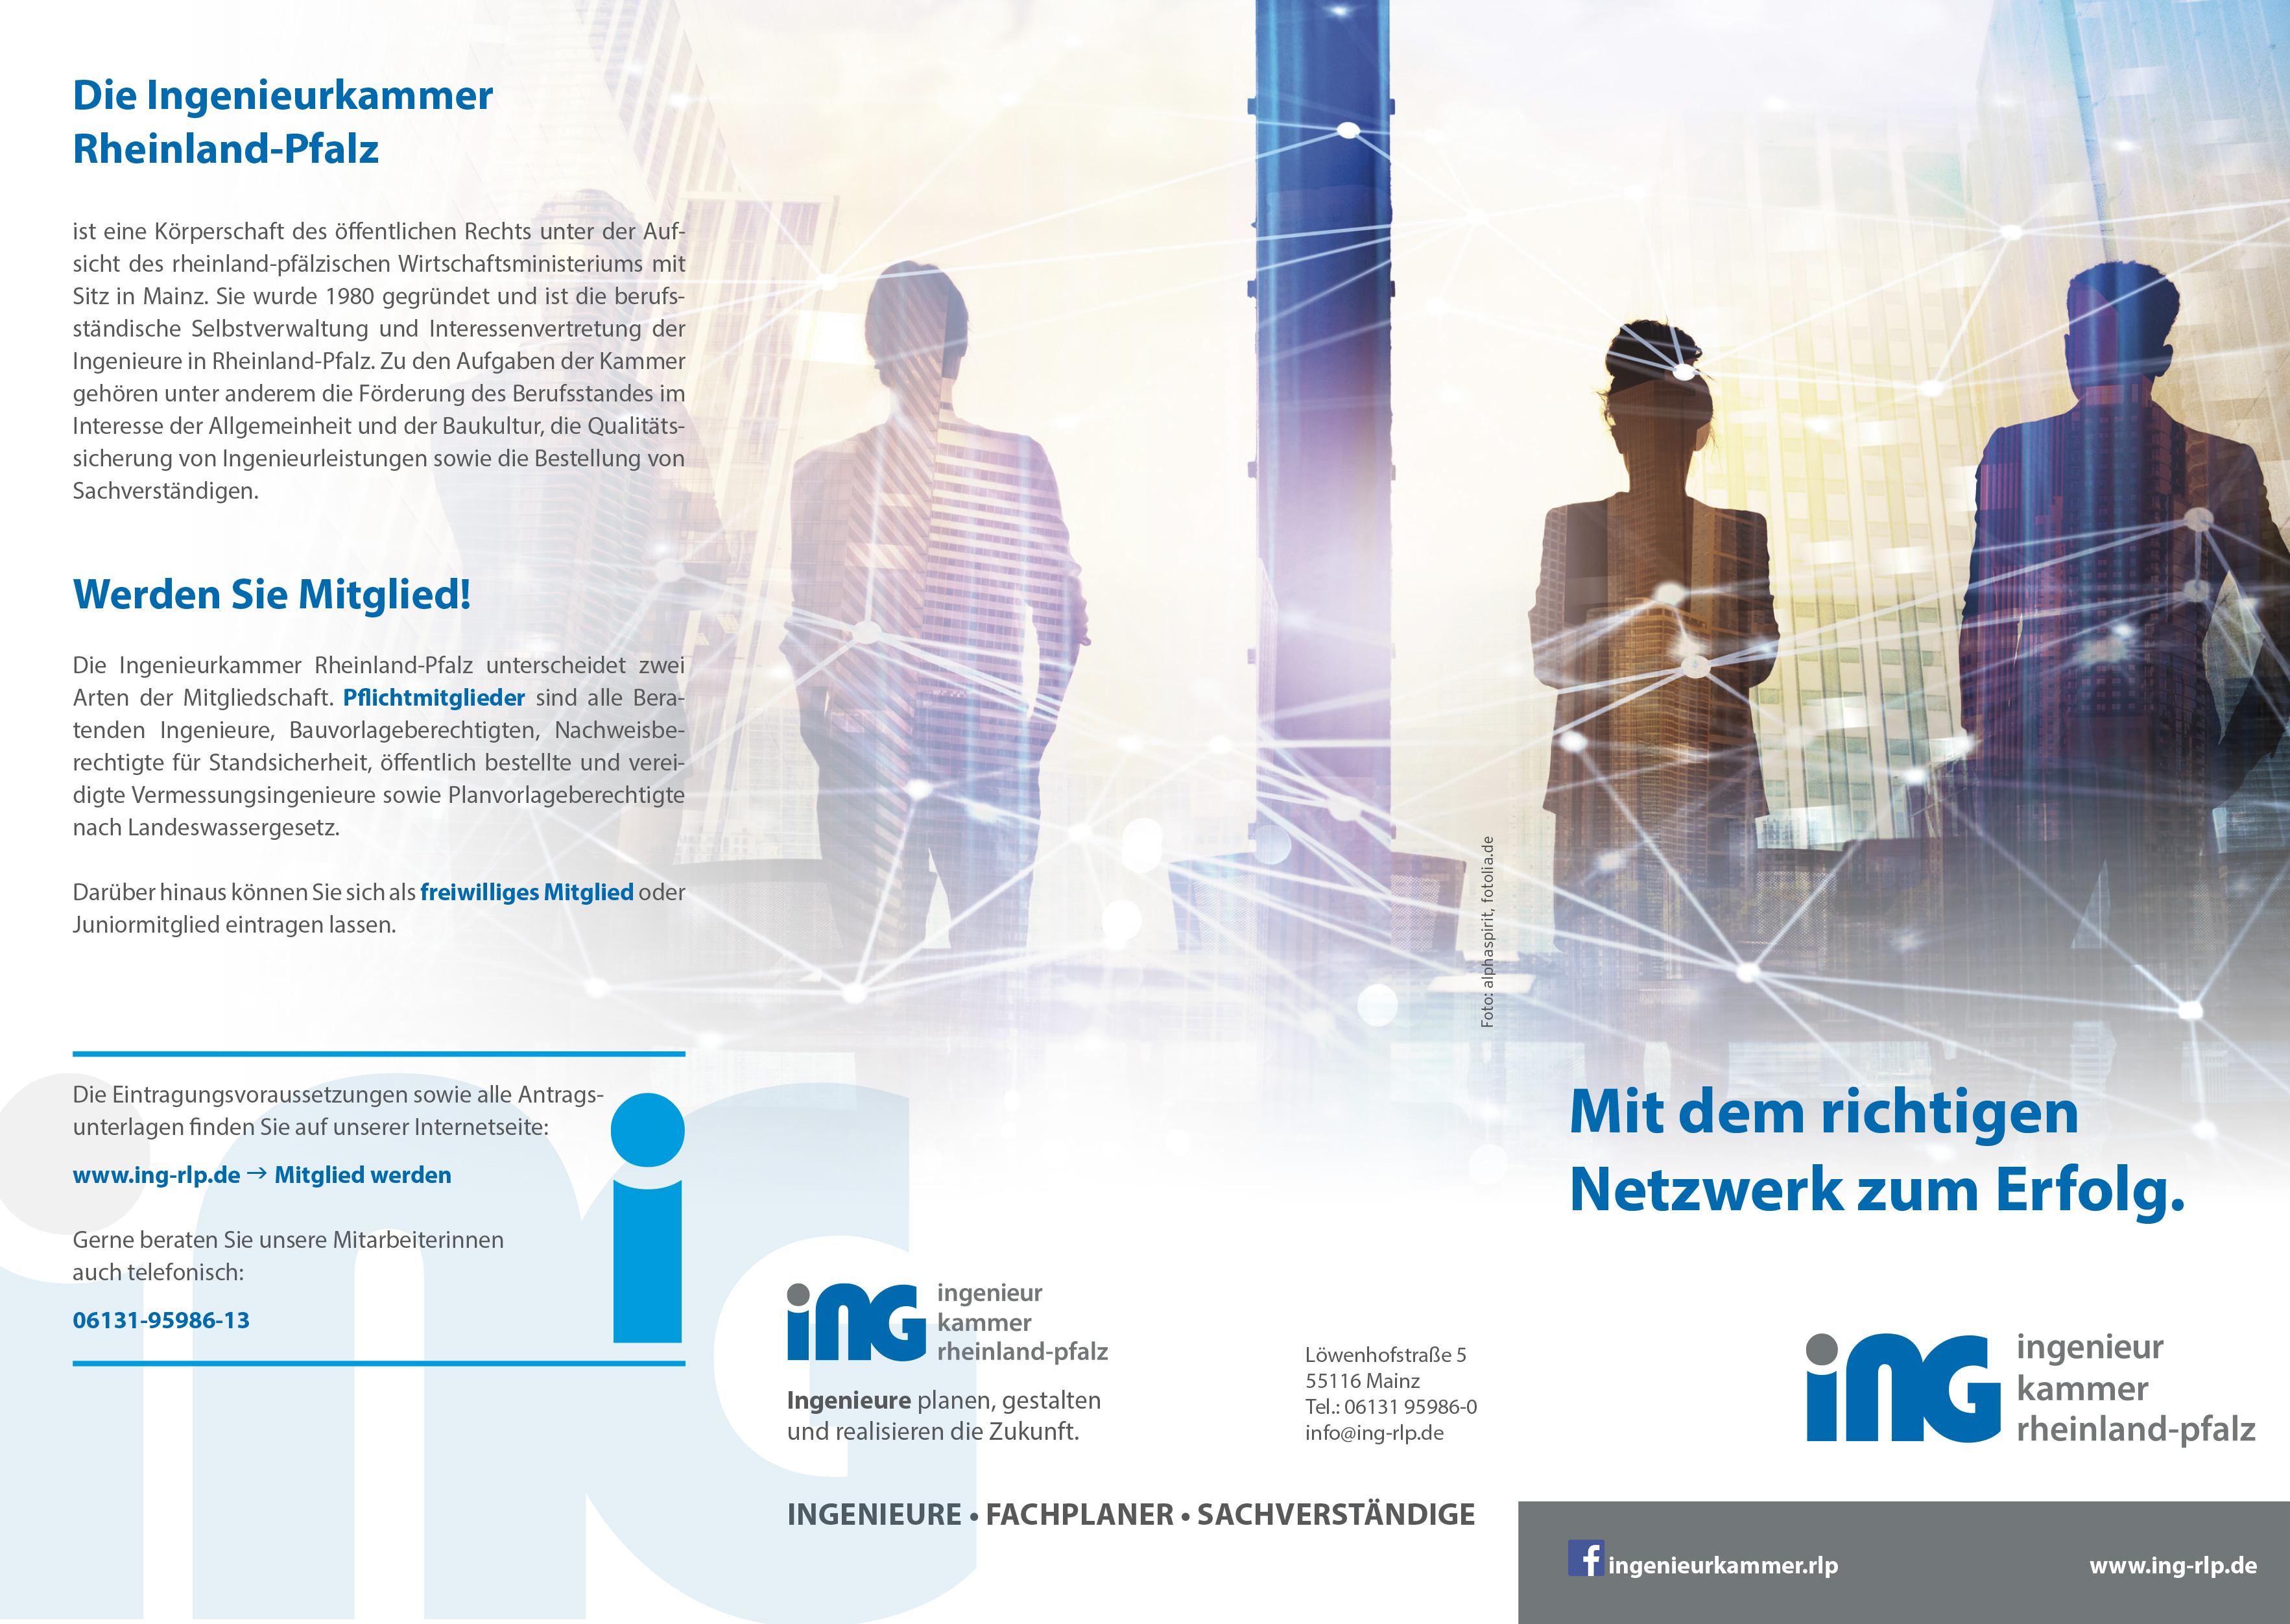 IngRLP_Mitglied_web1